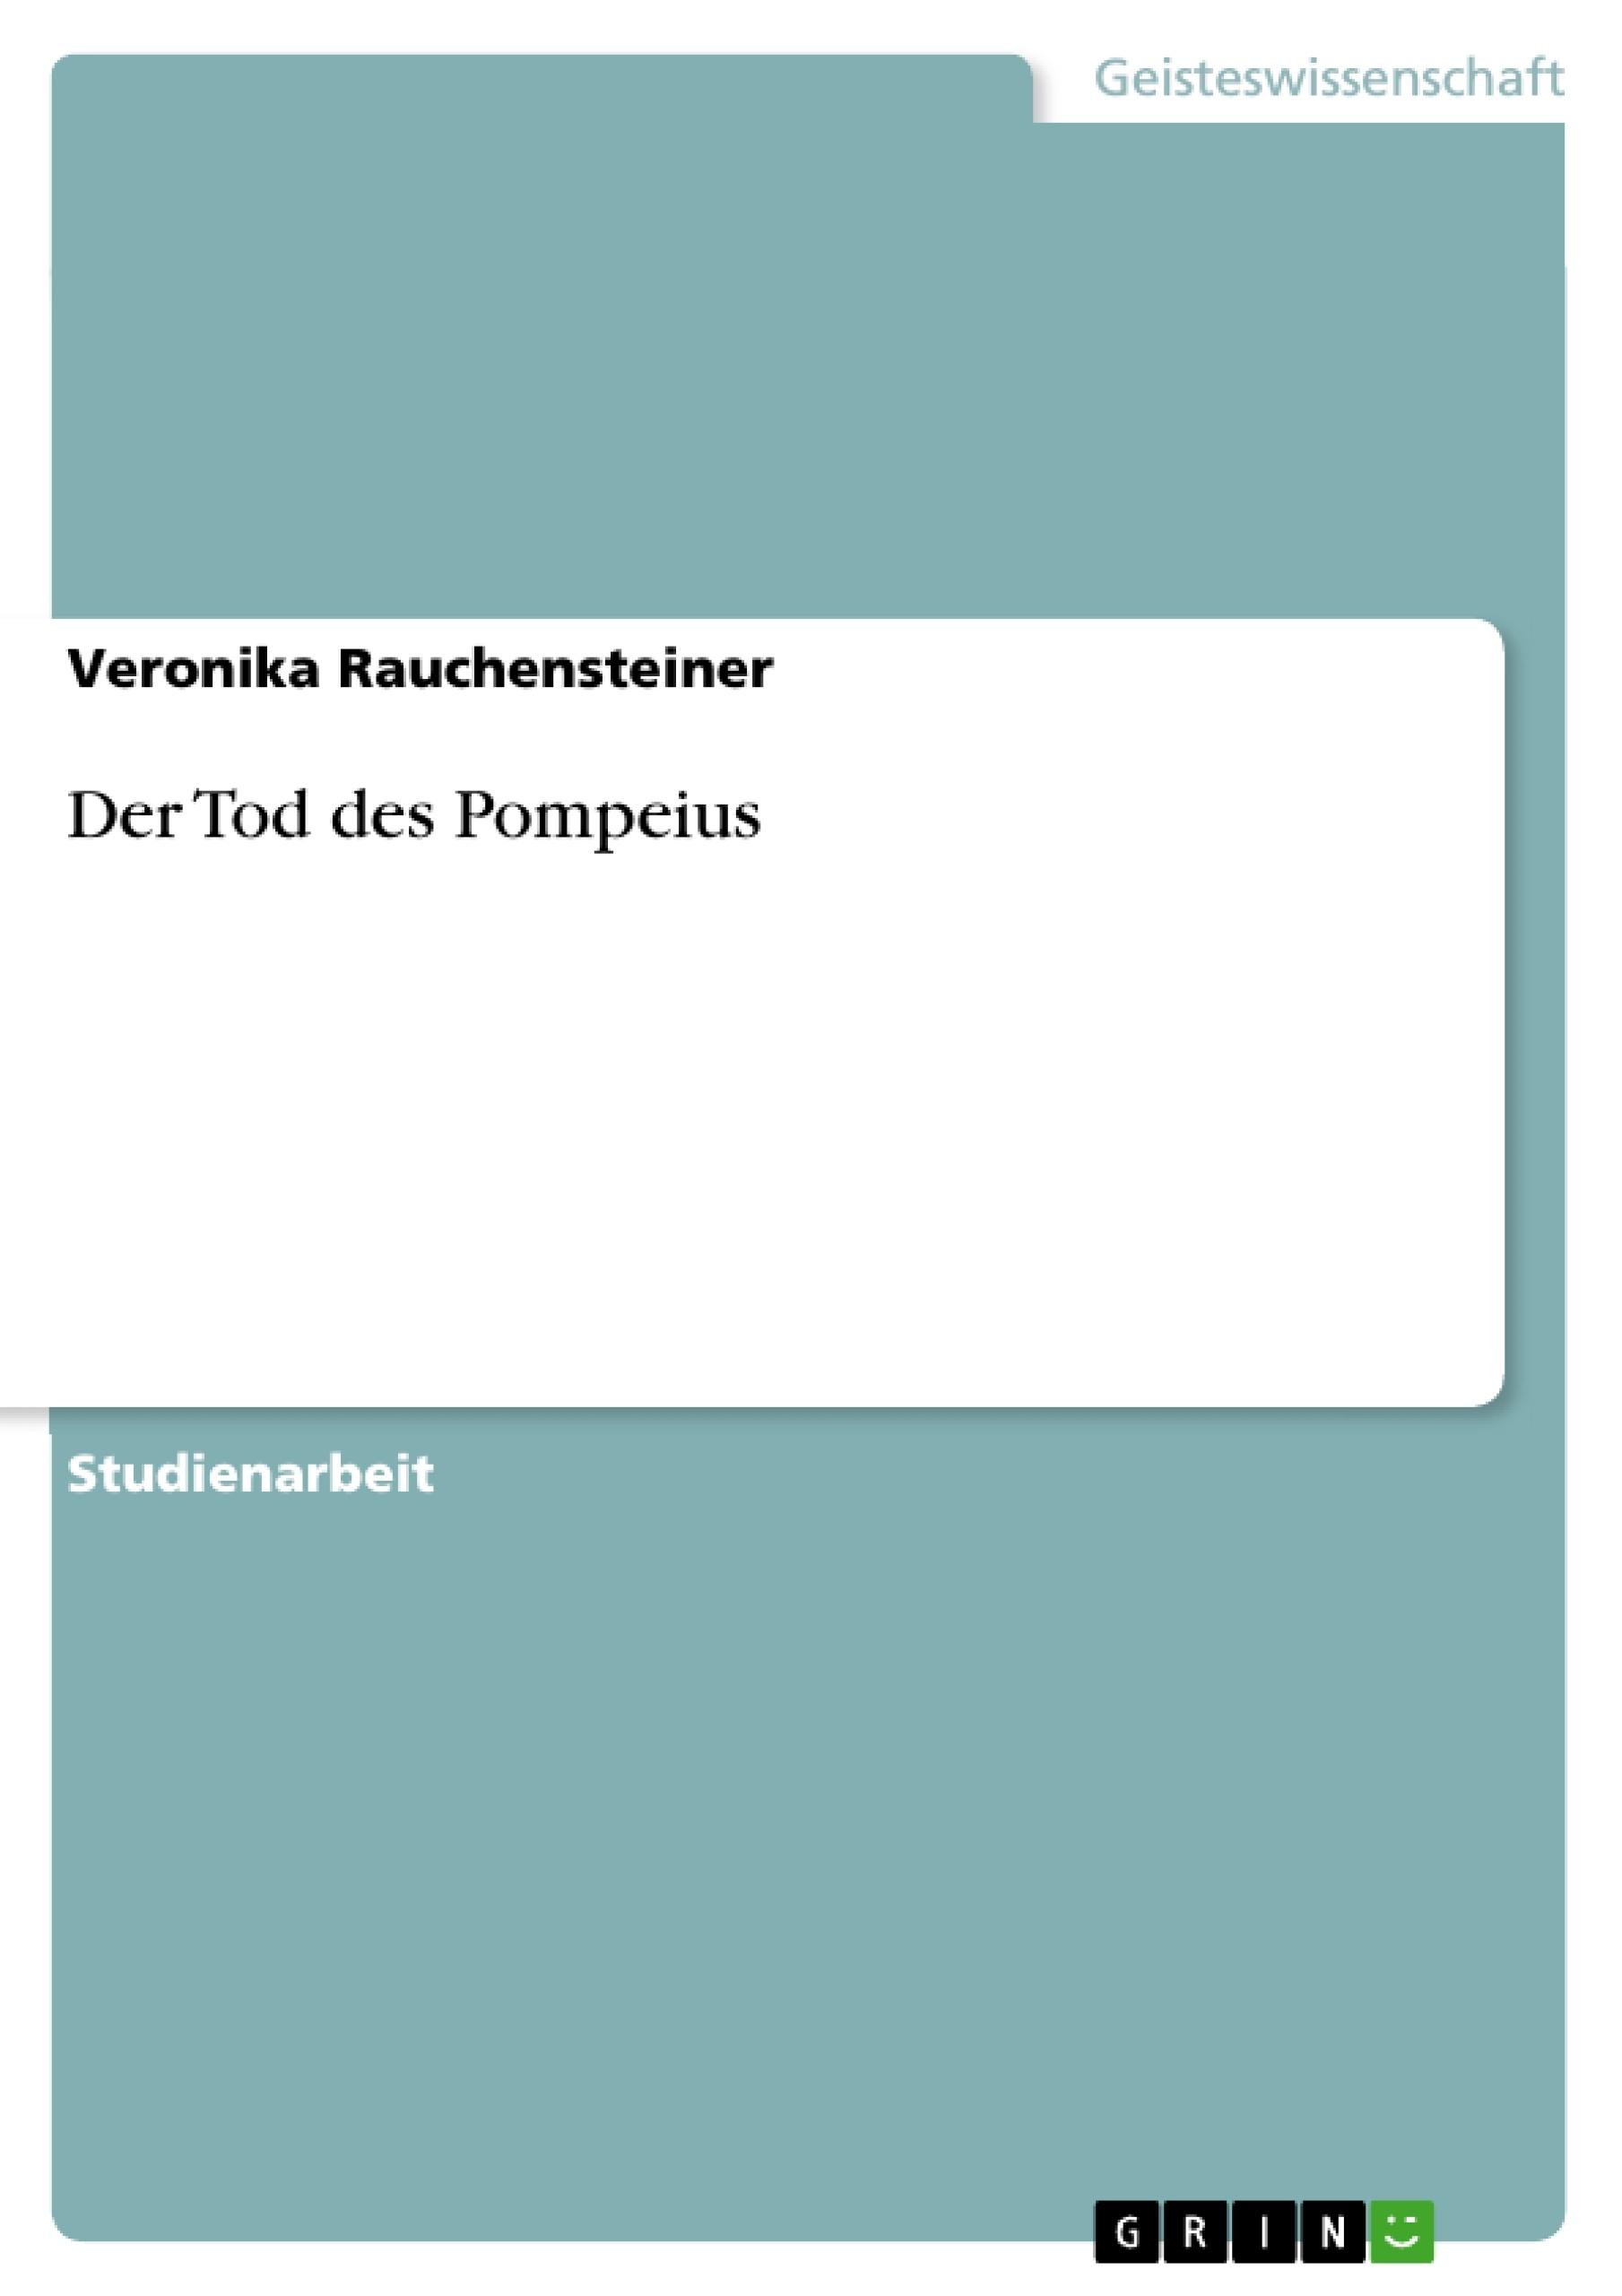 Titel: Der Tod des Pompeius